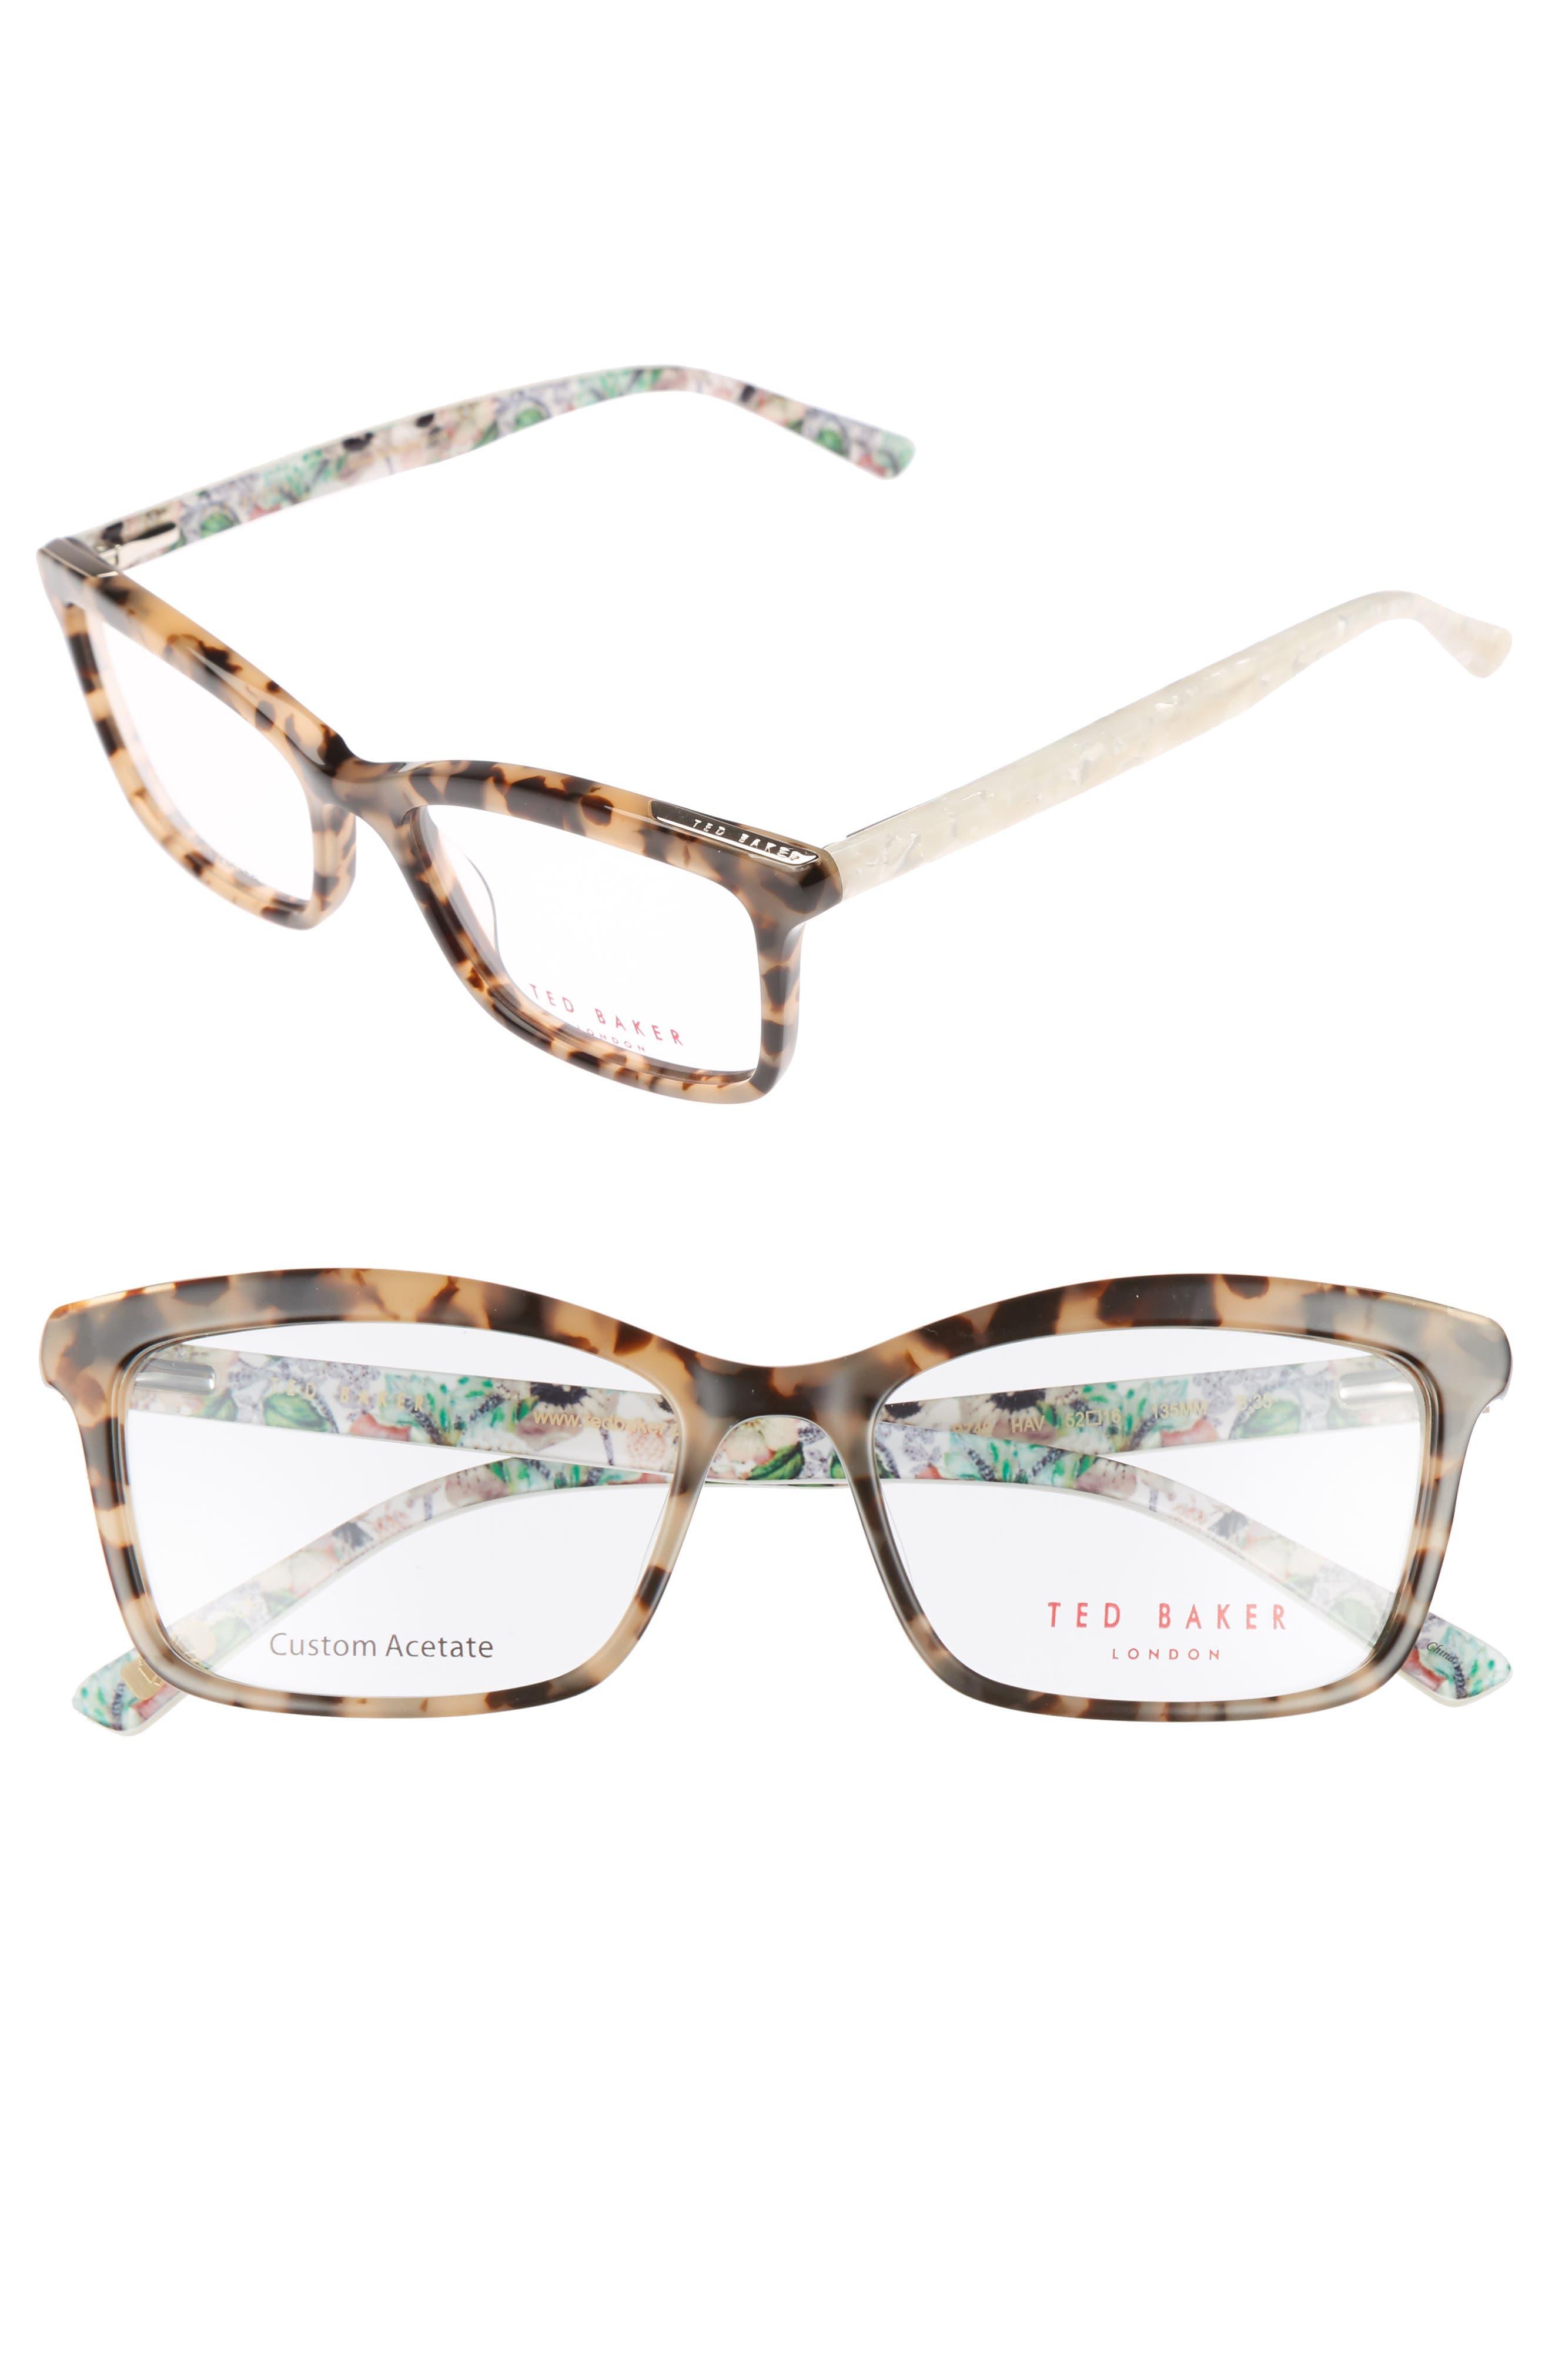 52mm Optical Glasses,                             Main thumbnail 1, color,                             200